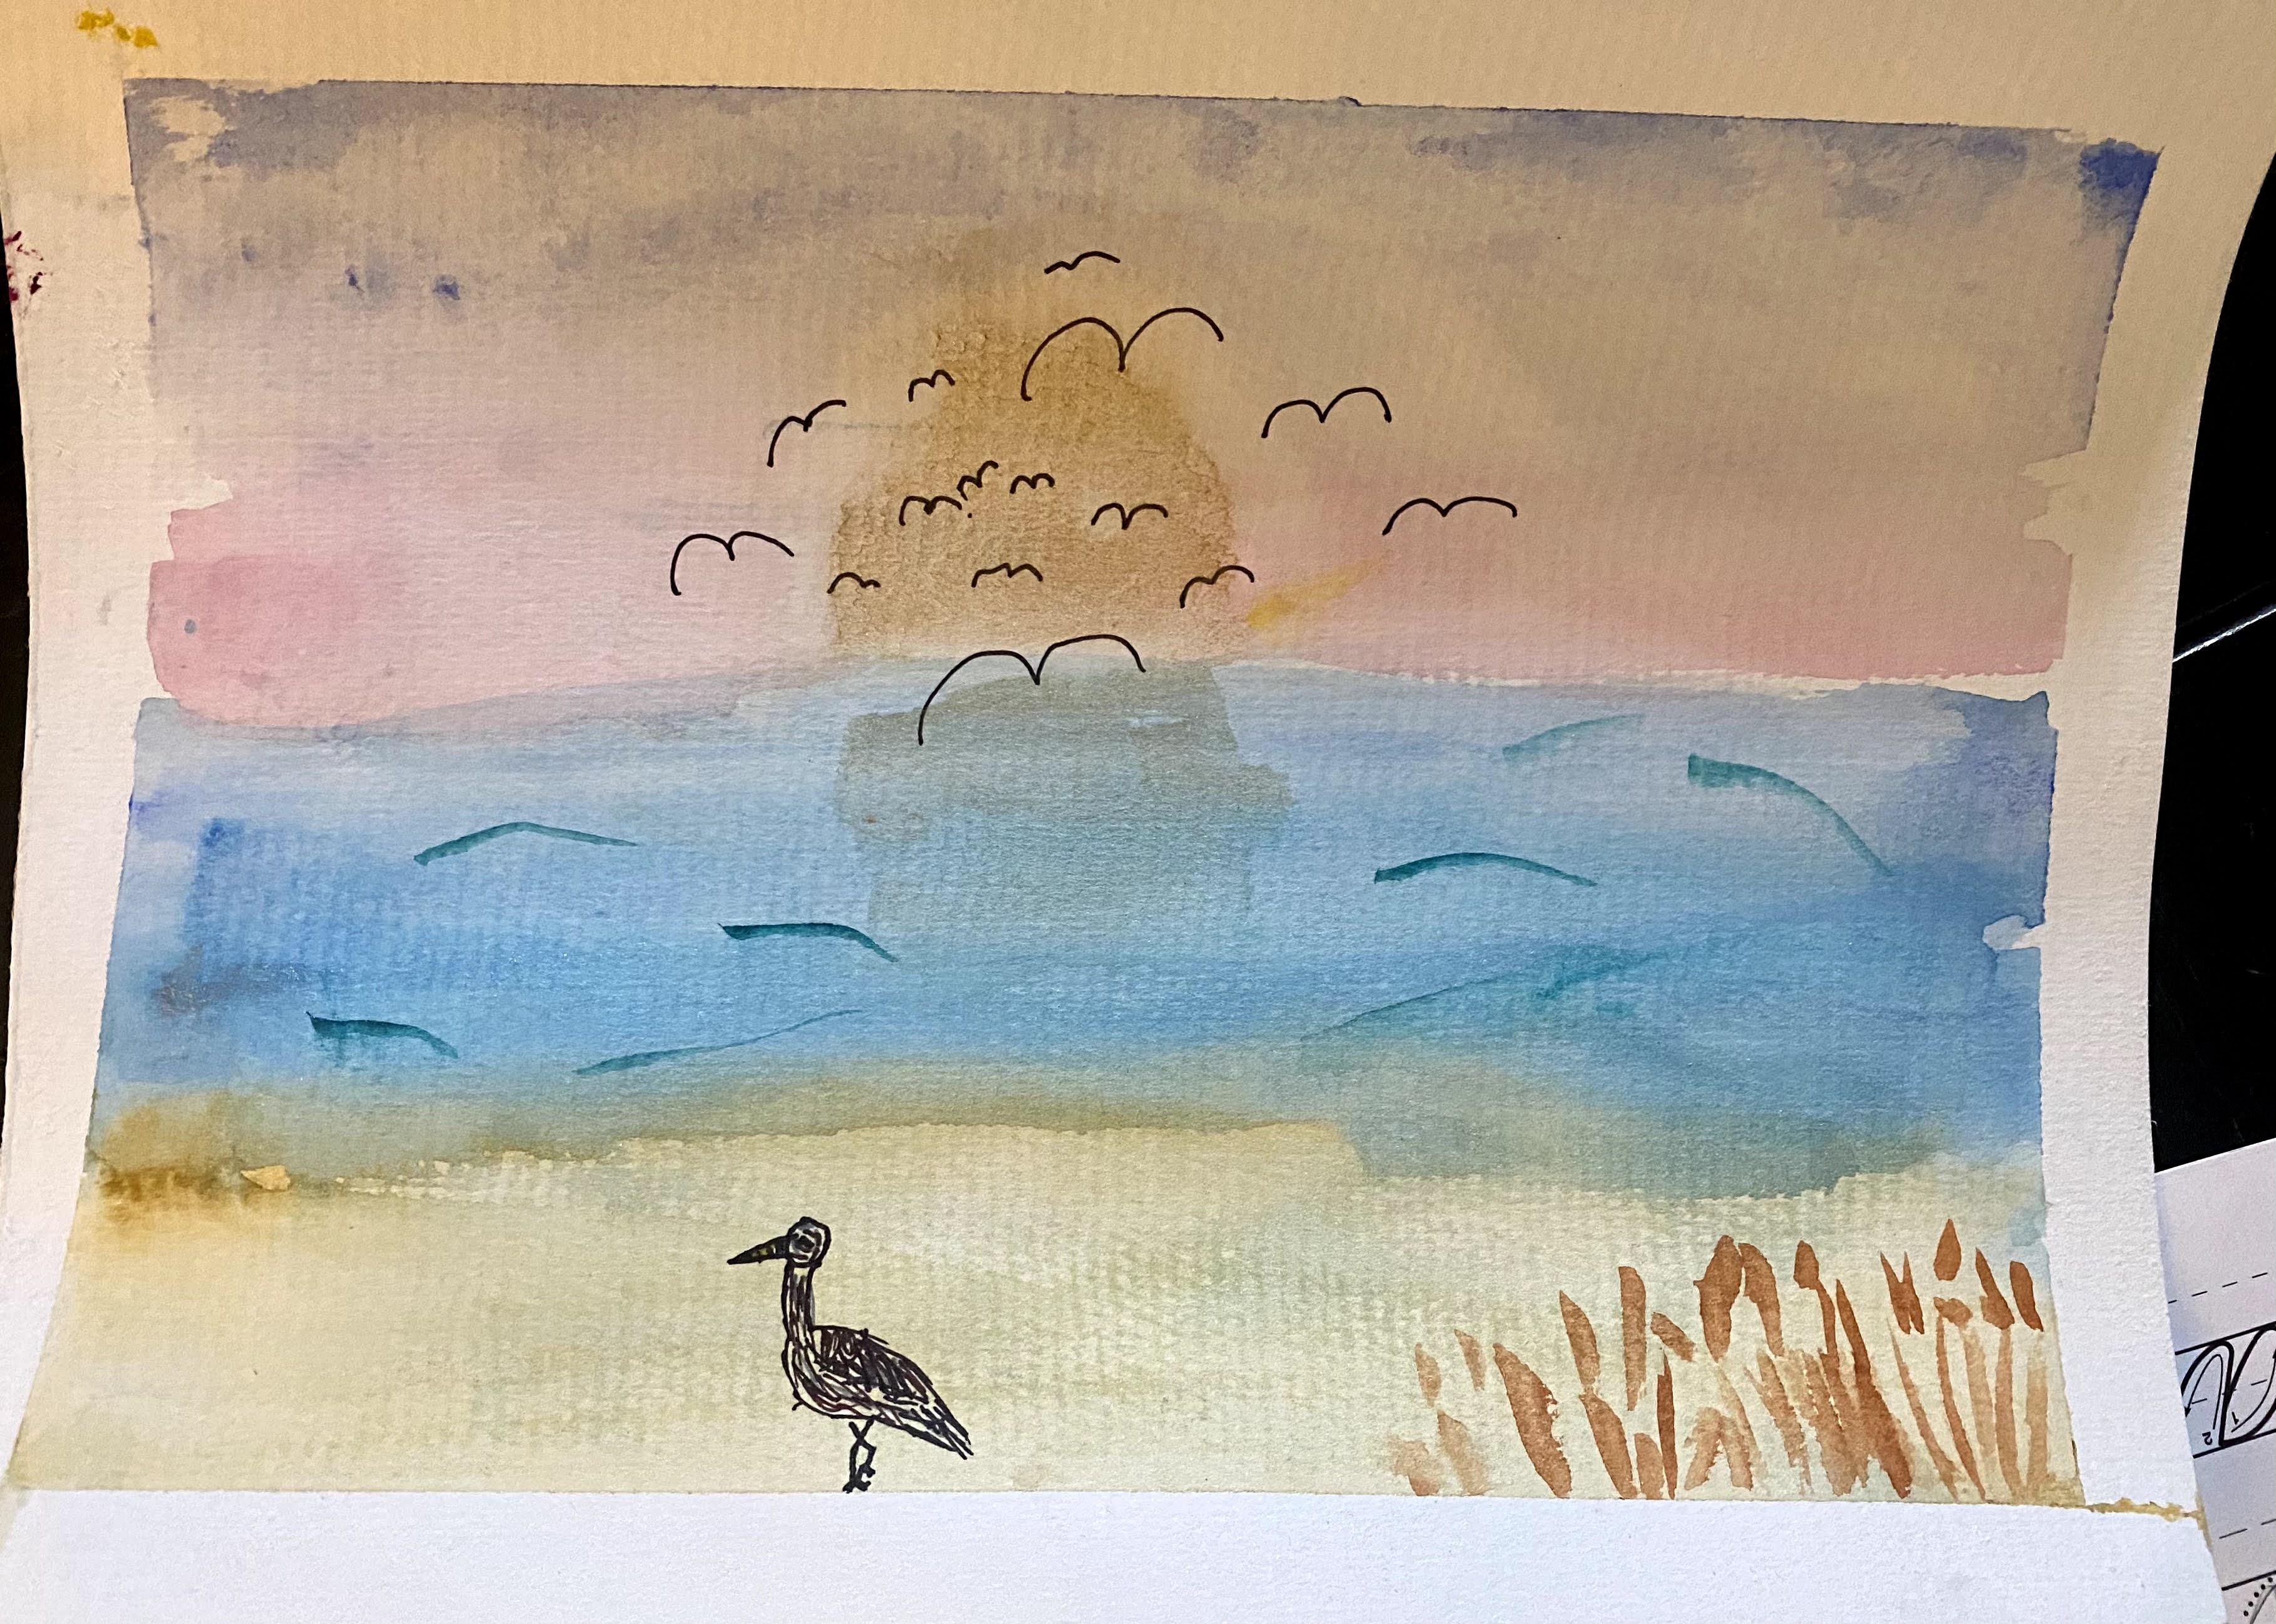 Lo's Cumberland Island painting